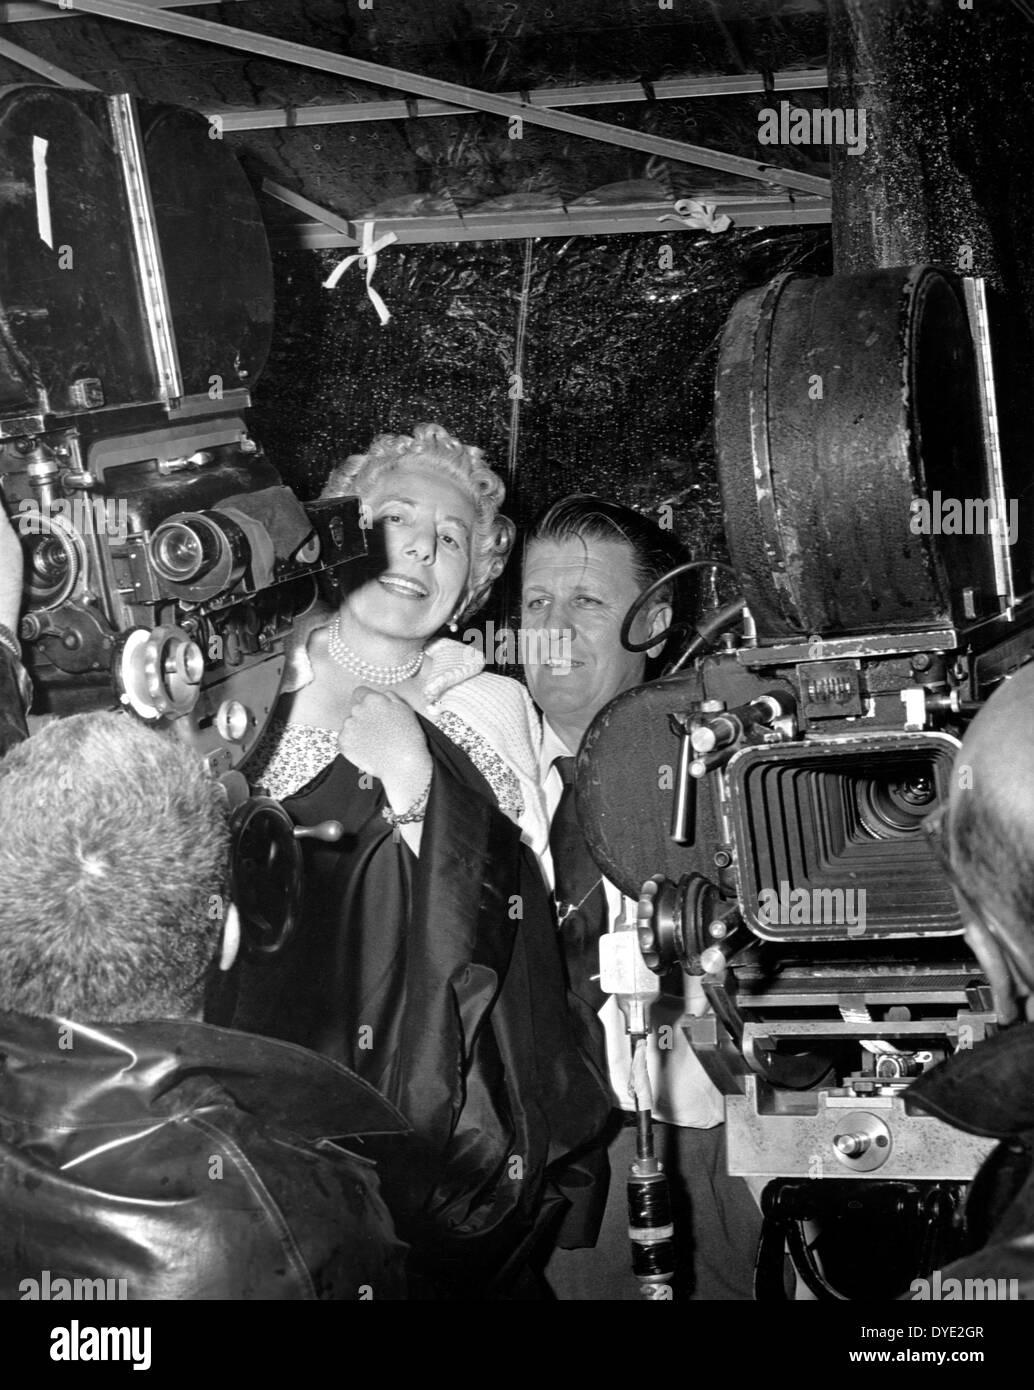 Novelist Edna Ferber and Director George Stevens, on-set of the Film, 'Giant', 1956 - Stock Image